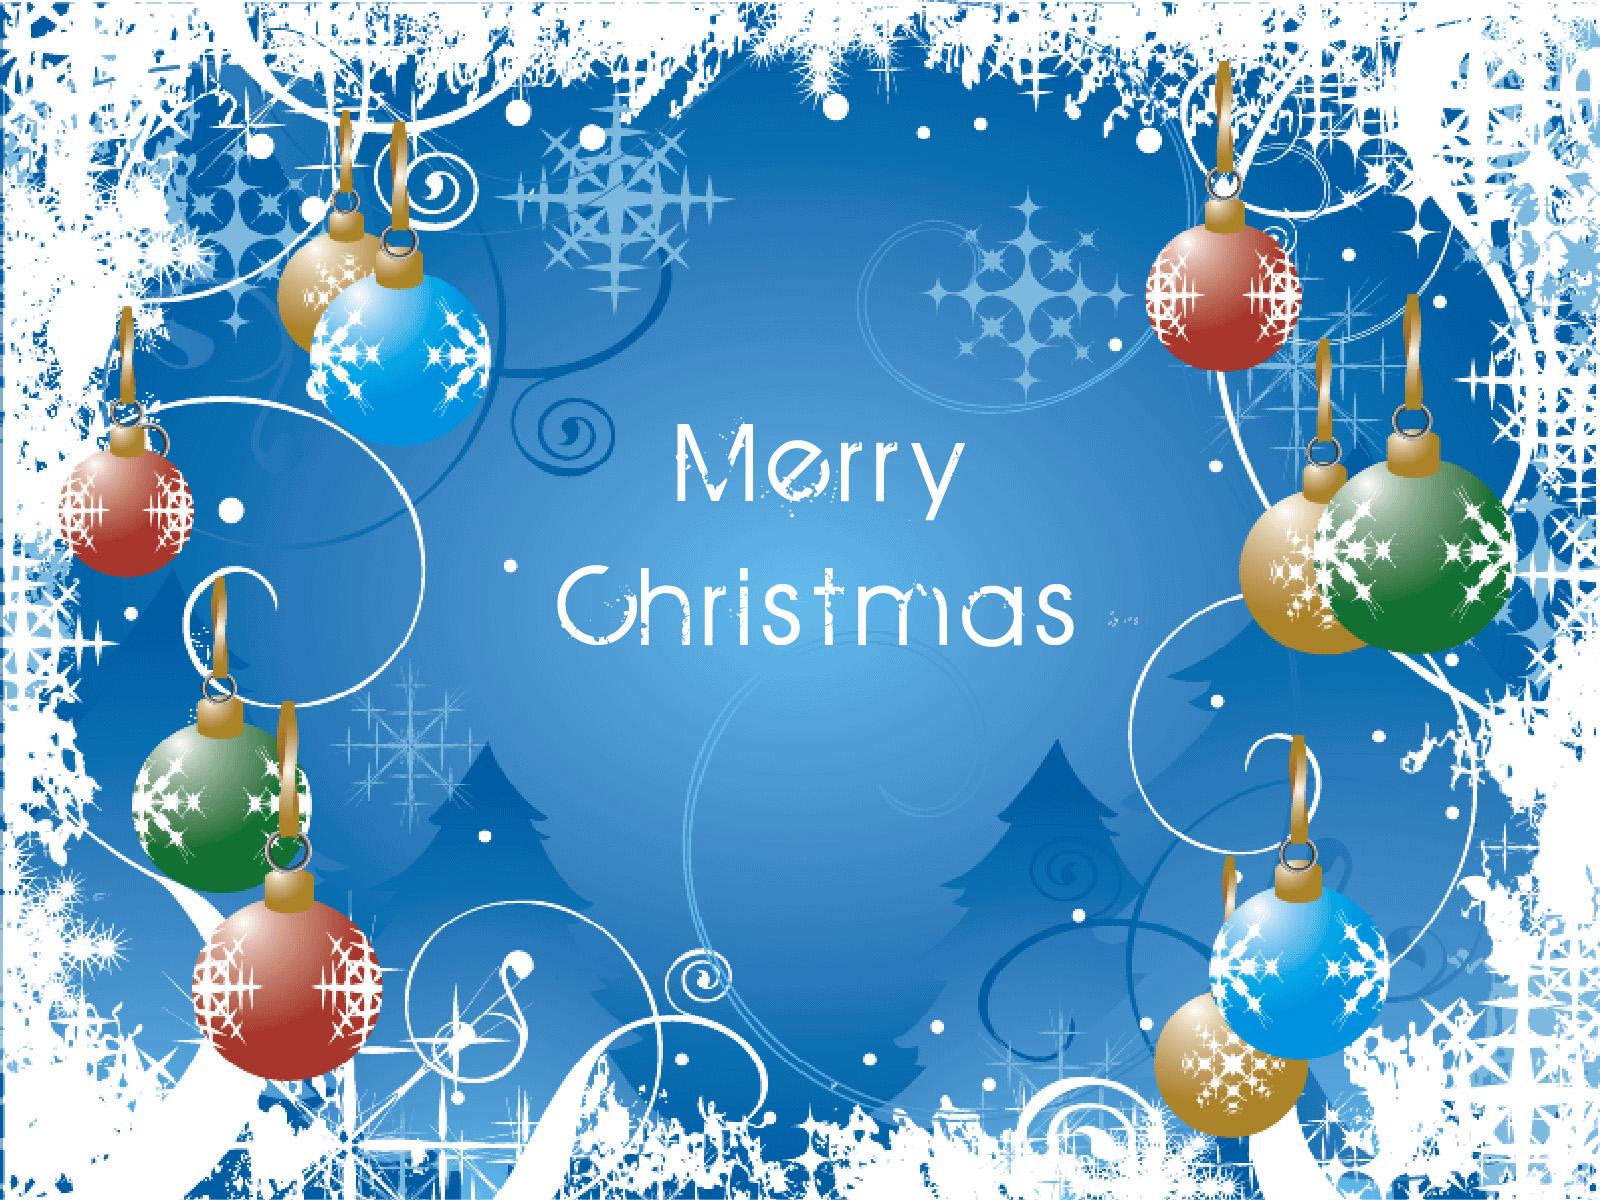 Merry Christmas Wallpapers HD free download PixelsTalk Free ...